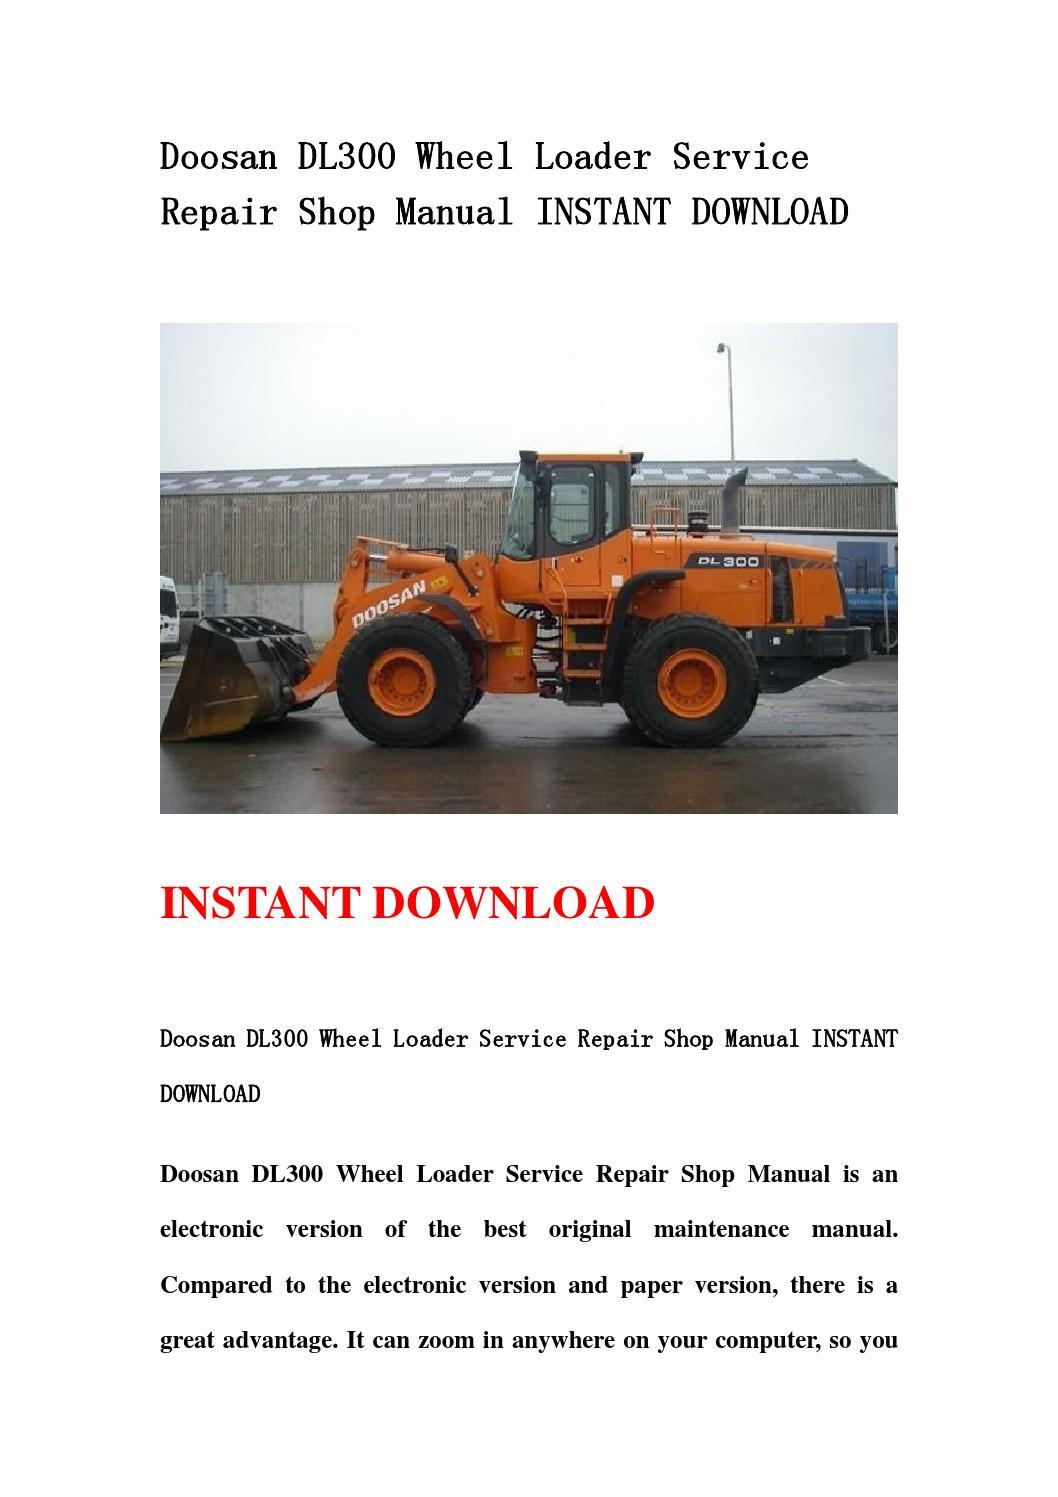 Doosan Dl300 Wheel Loader Service Repair Shop Manual